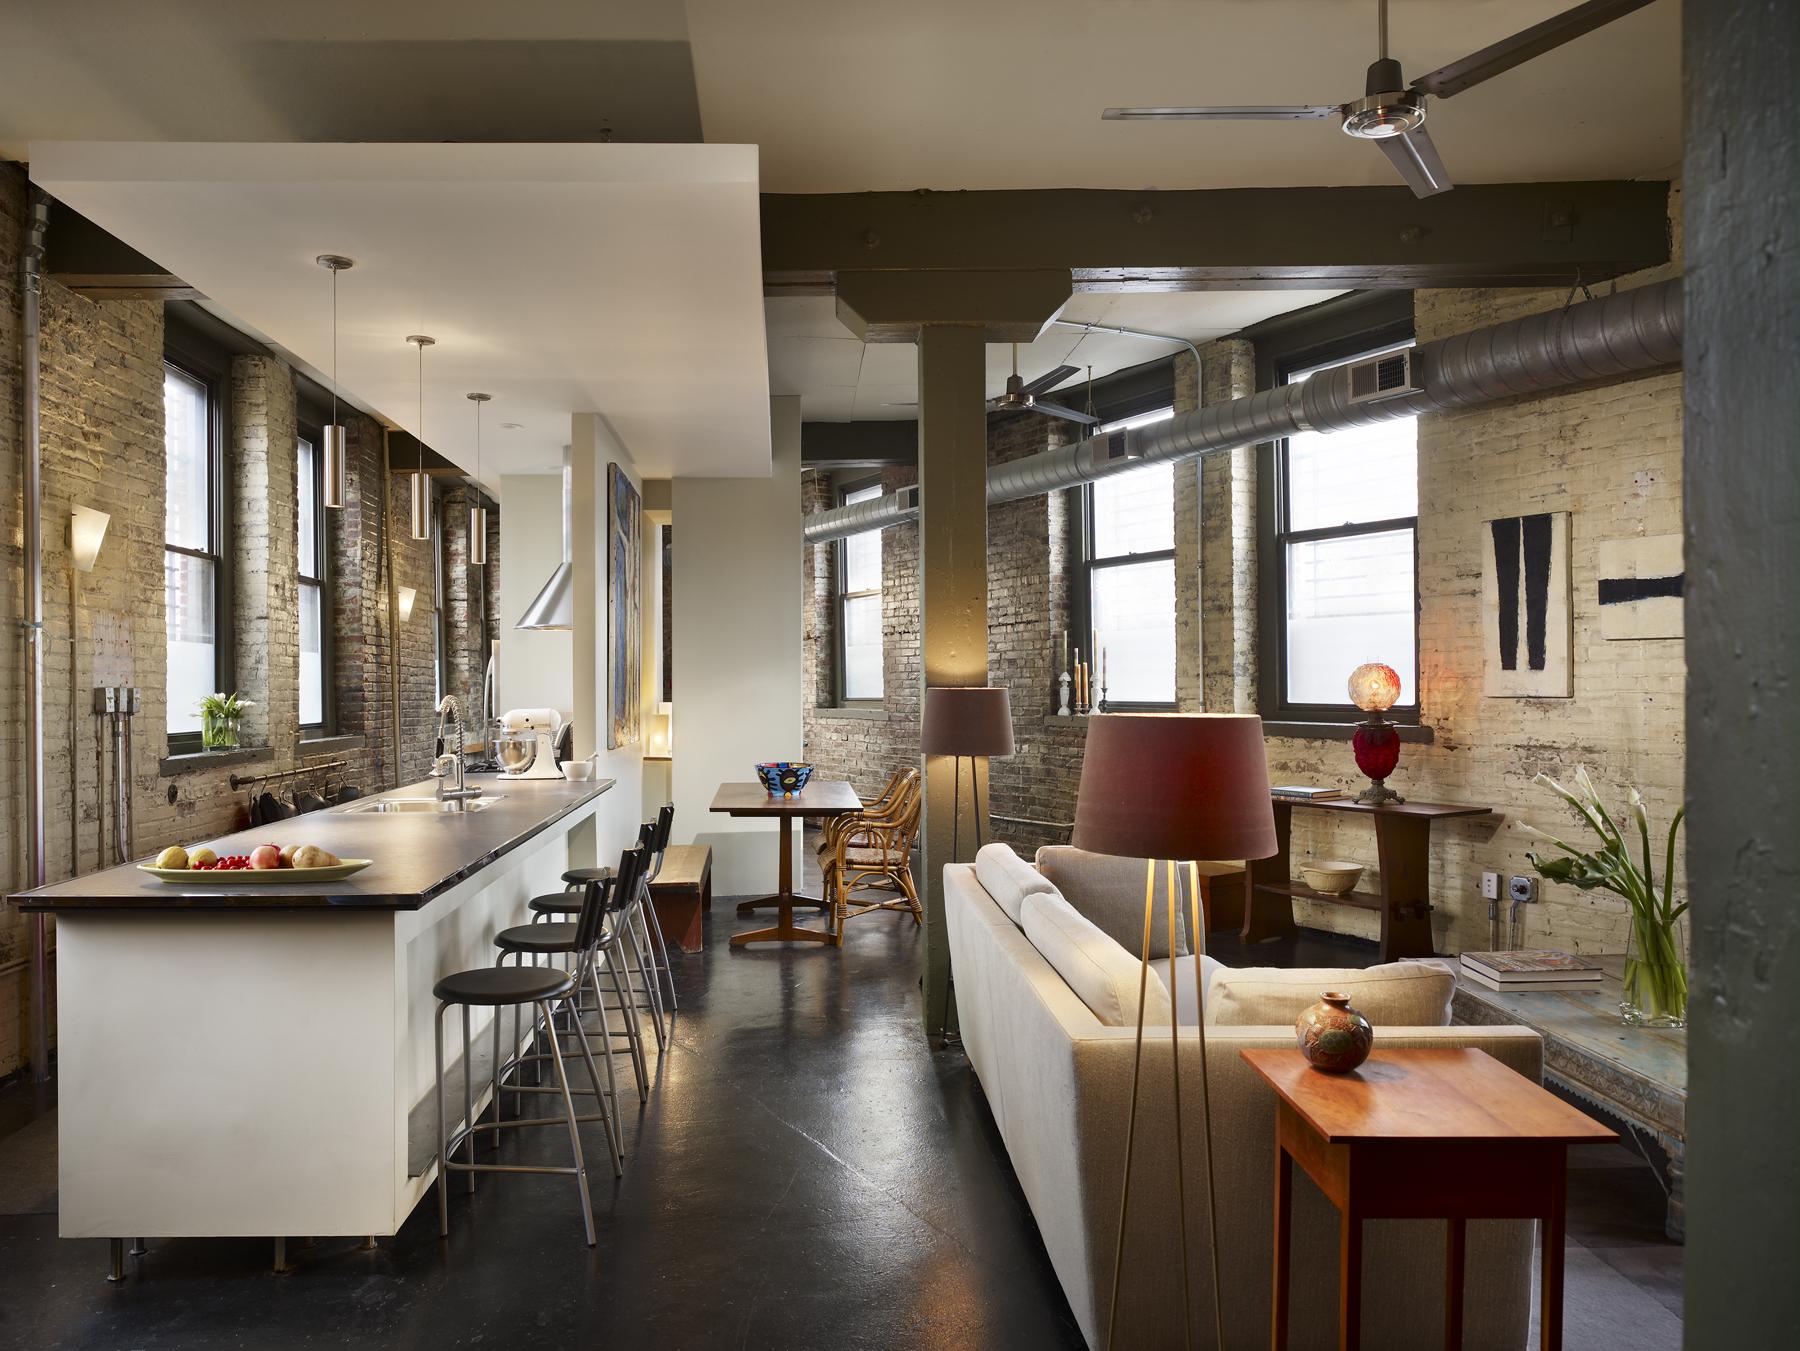 lawrence_kitchen.jpg